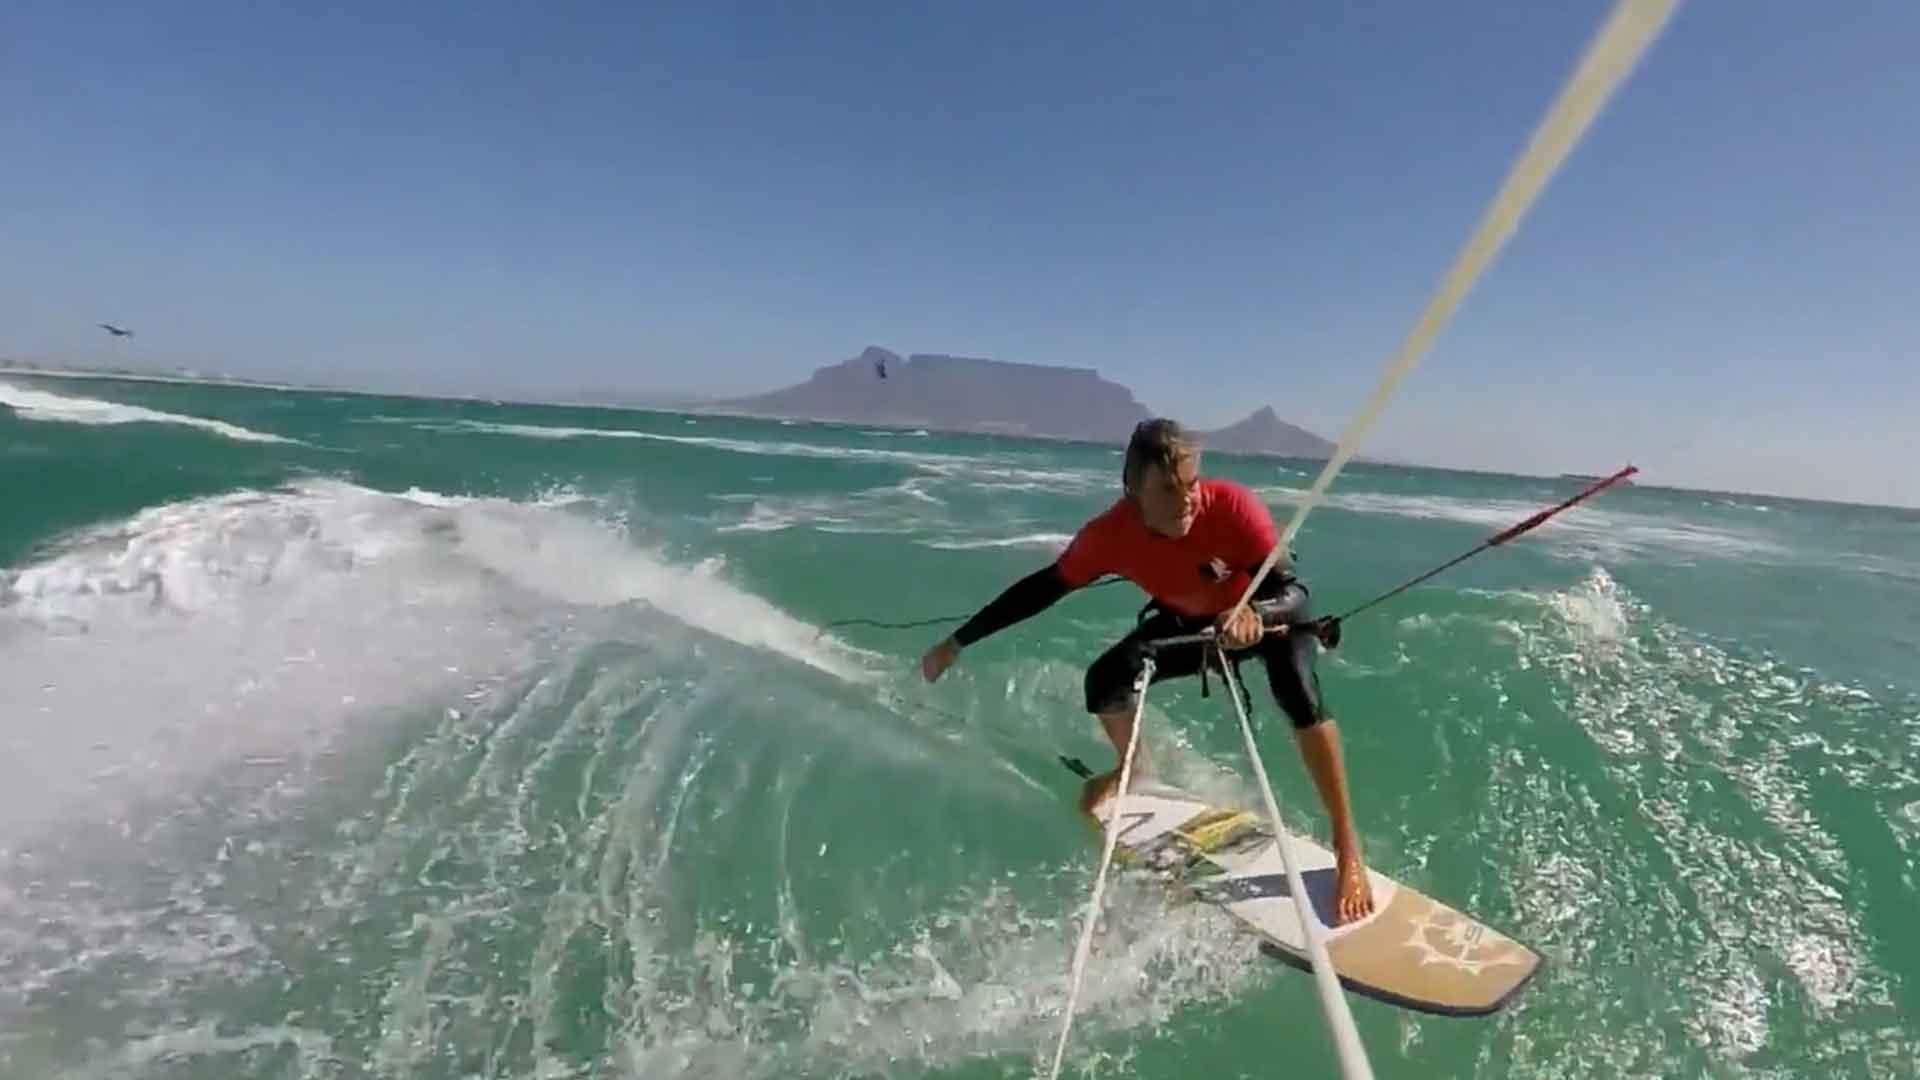 waves kitesurfing south africa